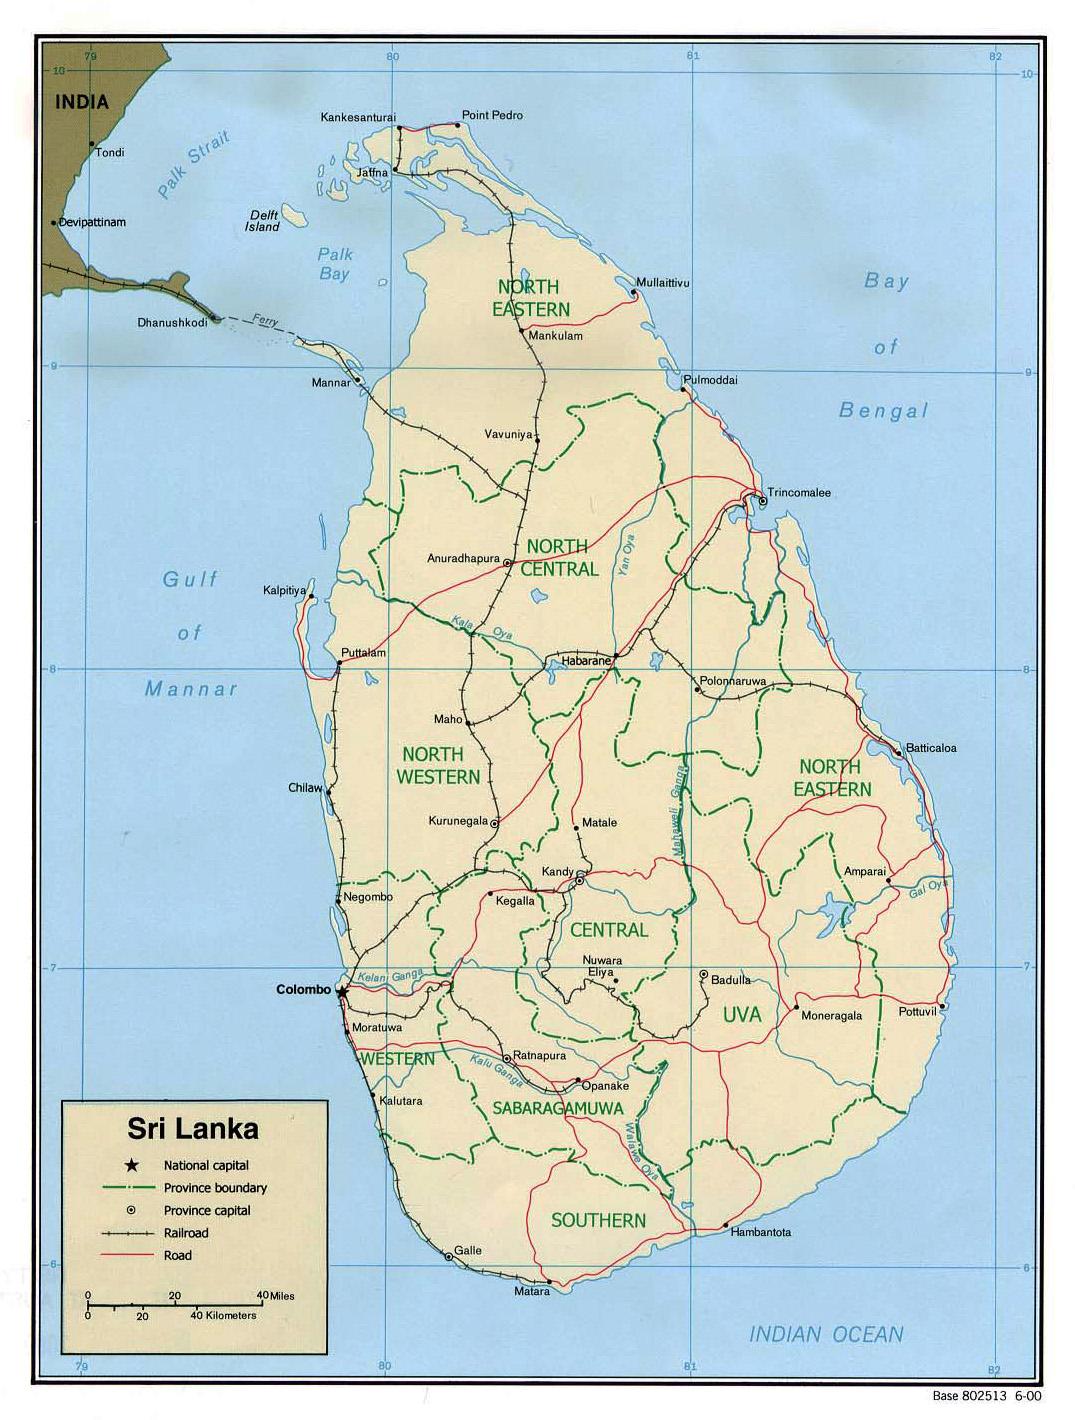 Maps Of Sri Lanka Detailed Map Of Sri Lanka In English Tourist - Where is sri lanka